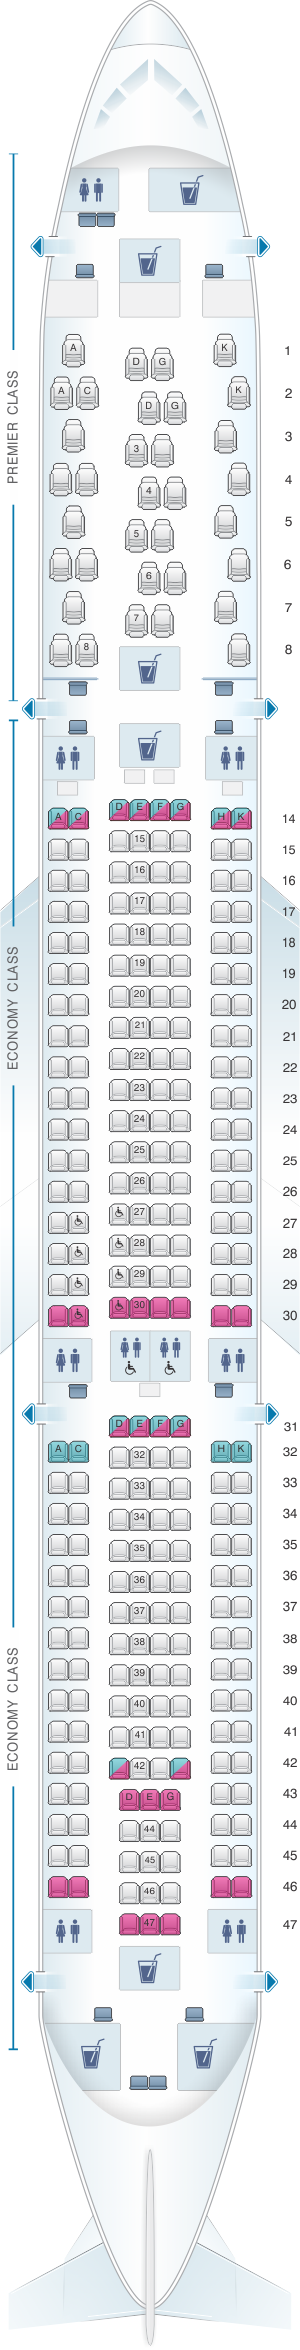 Seat Map Jet Airways Airbus A330 300 293PAX Air transat